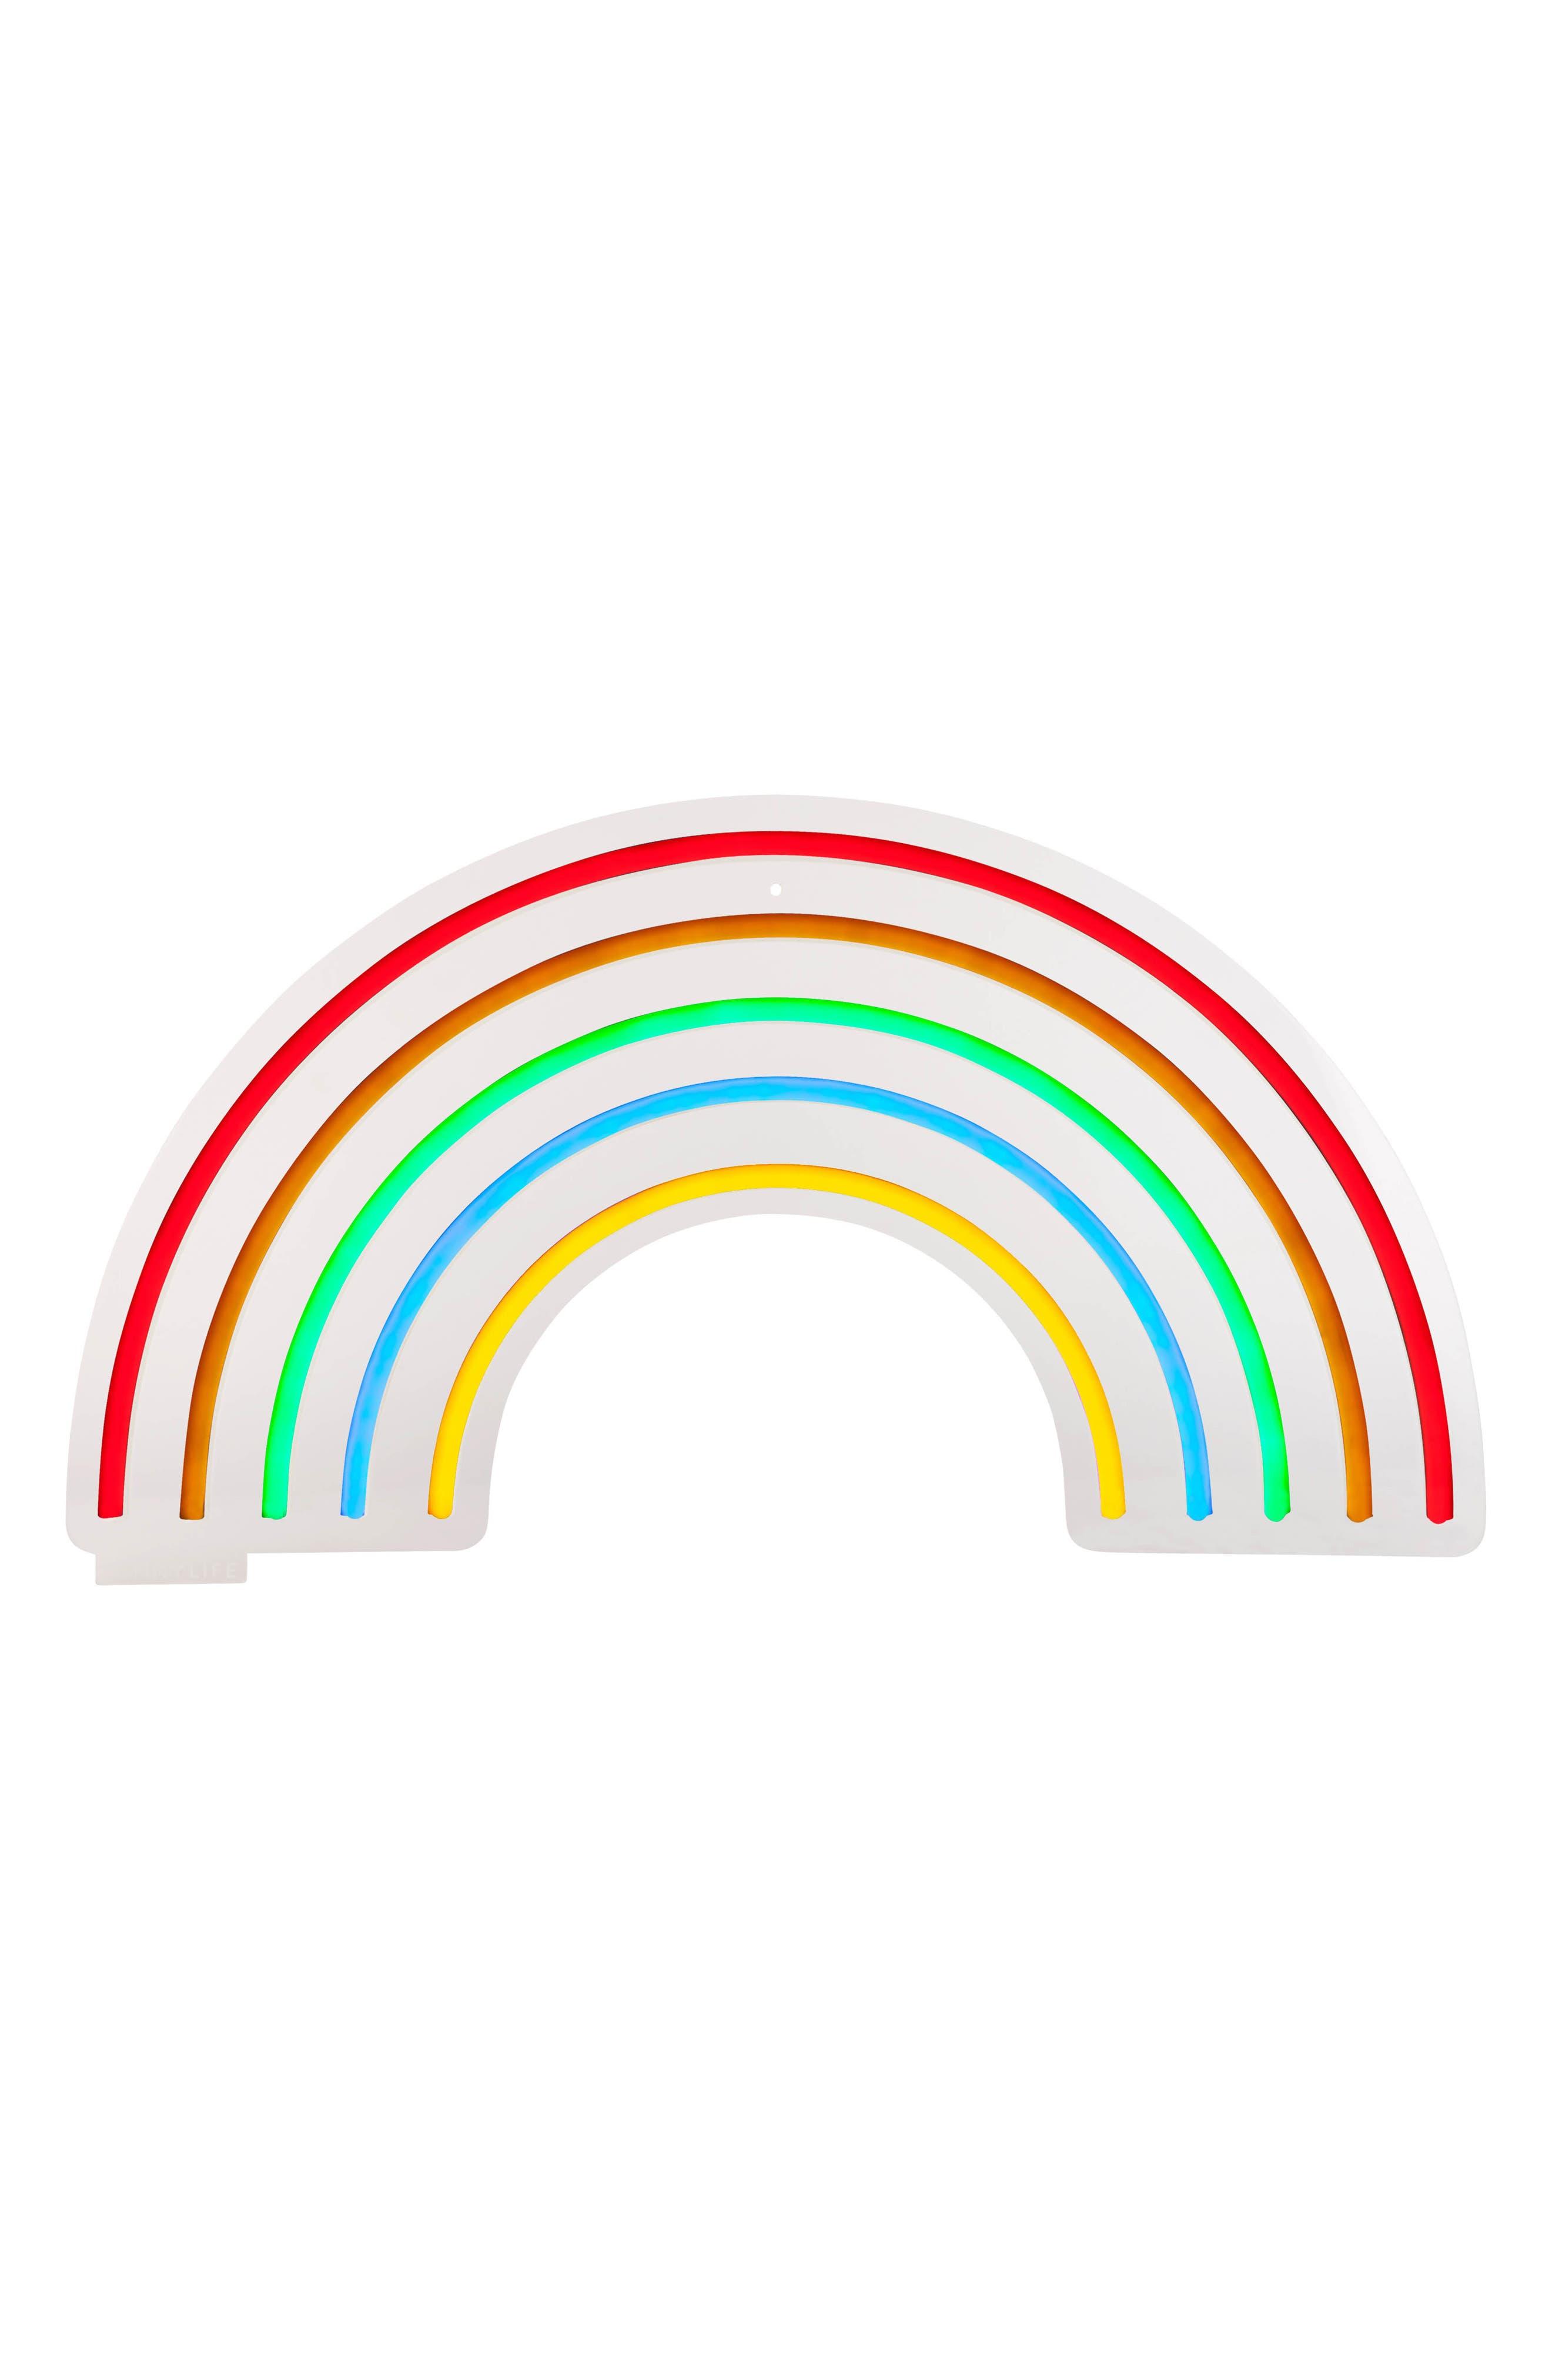 Rainbow Neon LED Wall Light,                             Main thumbnail 1, color,                             Multi